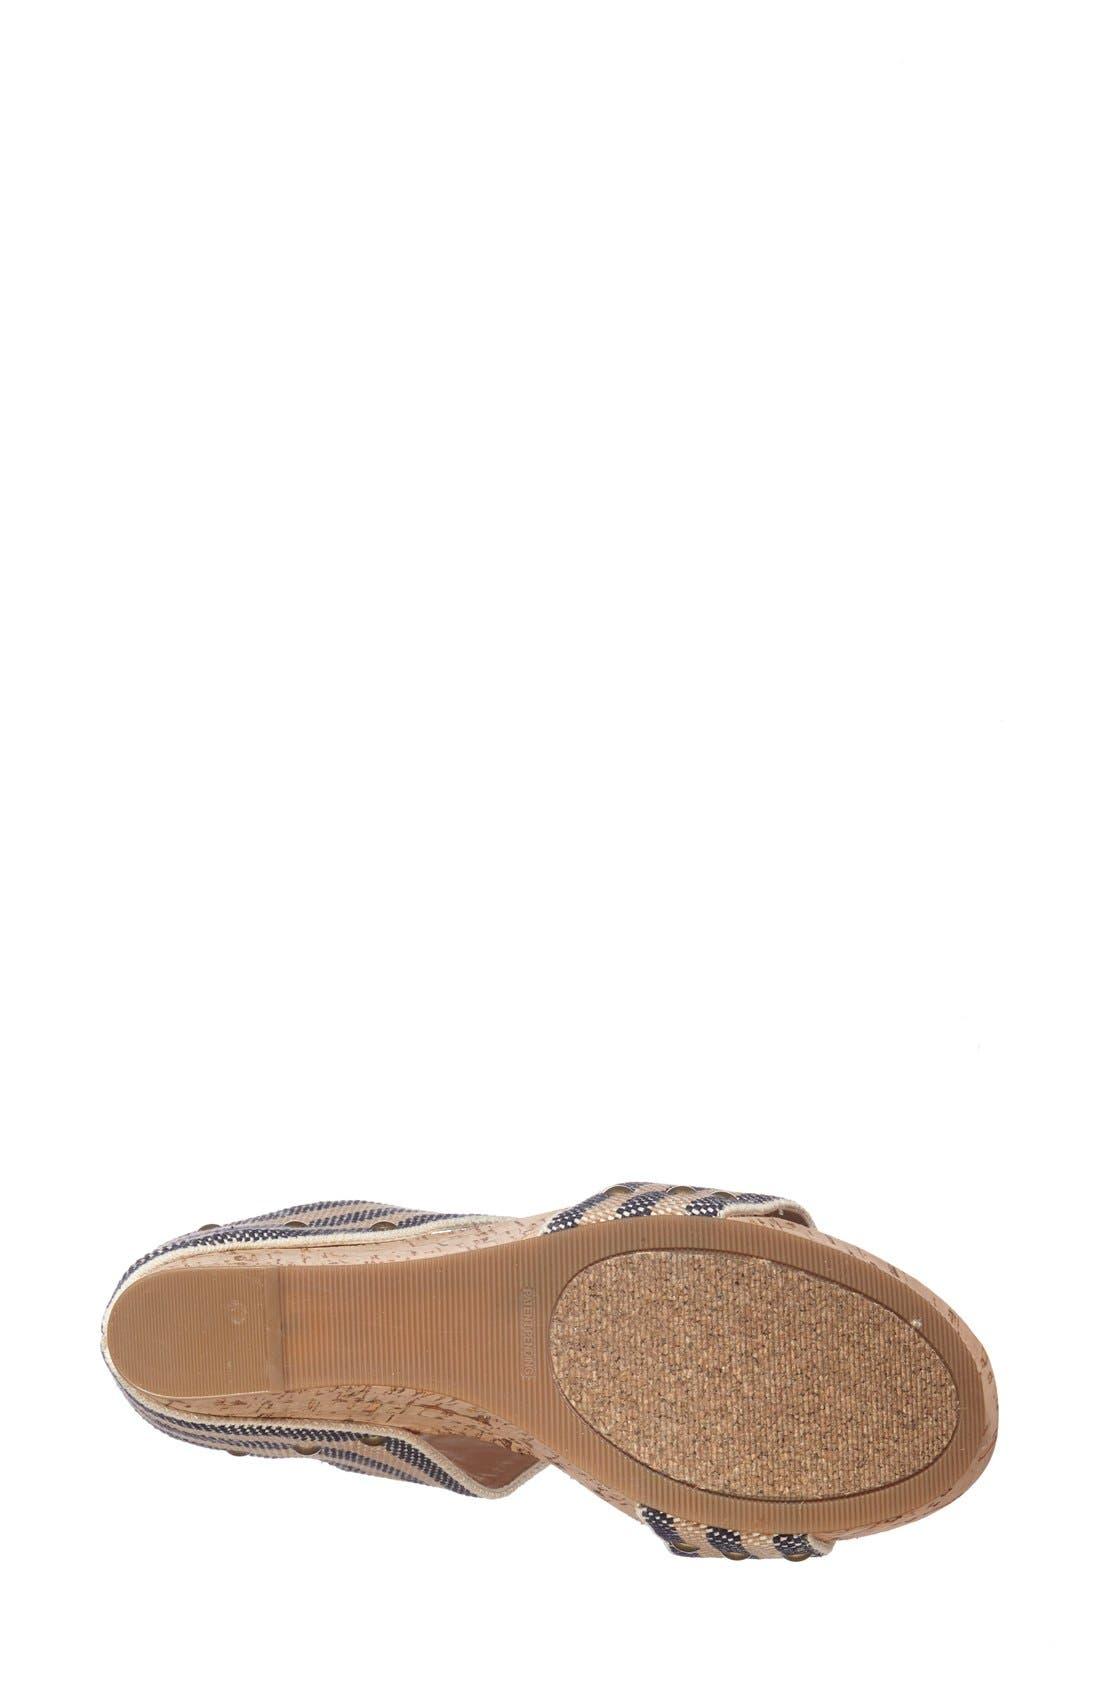 'Emilia 2' Wedge Sandal,                             Alternate thumbnail 8, color,